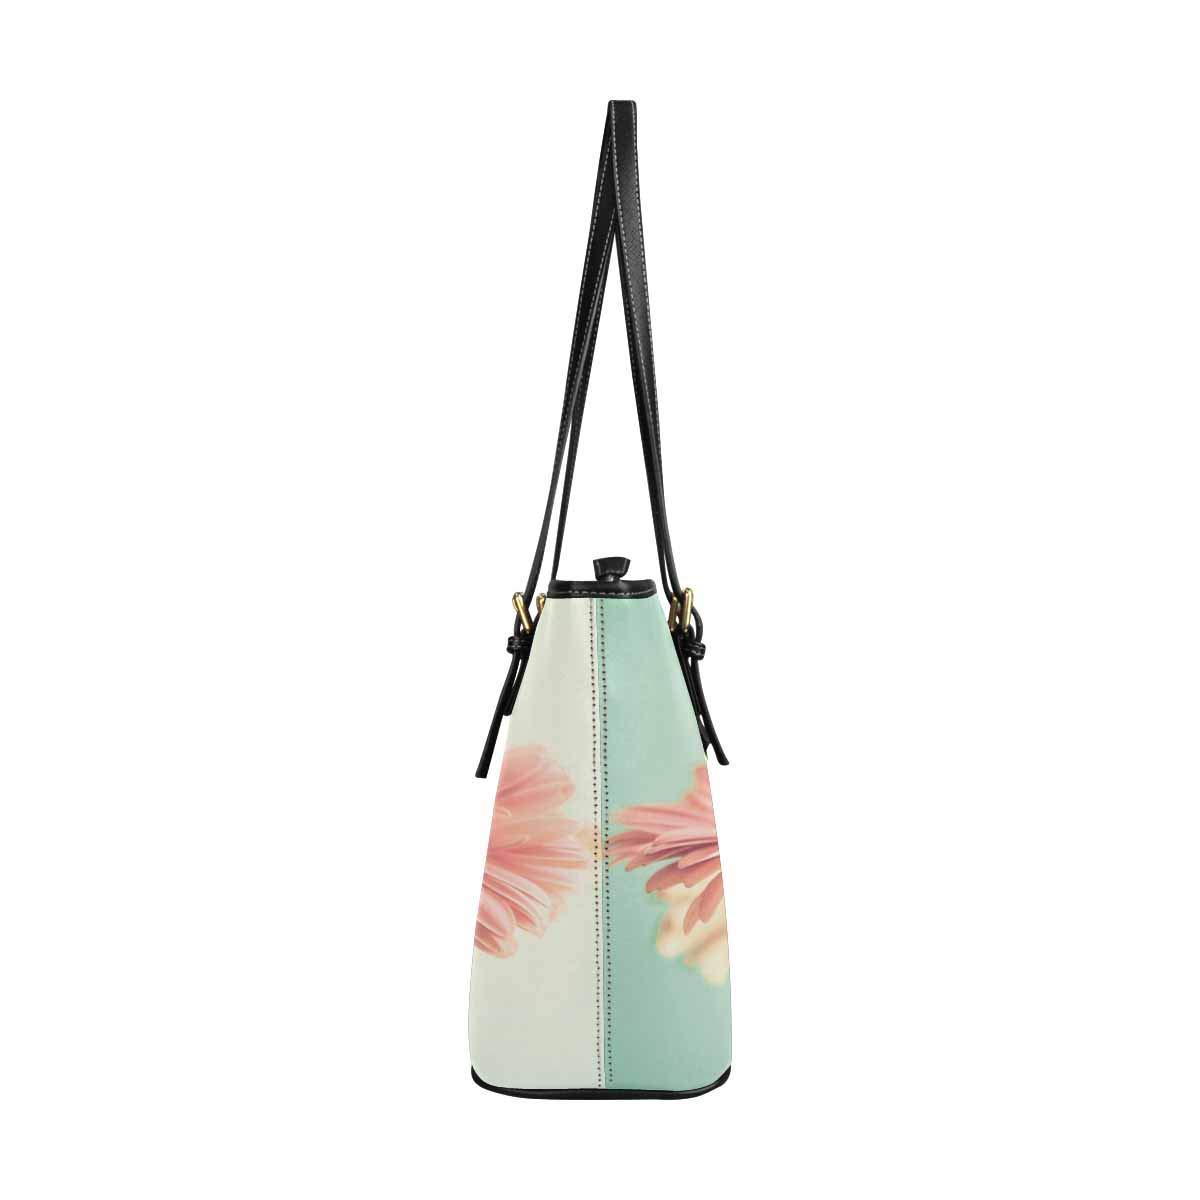 InterestPrint Top Handle Satchel HandBags Shoulder Bags Tote Bags Purse Two Pale Pink Daisy Flowers